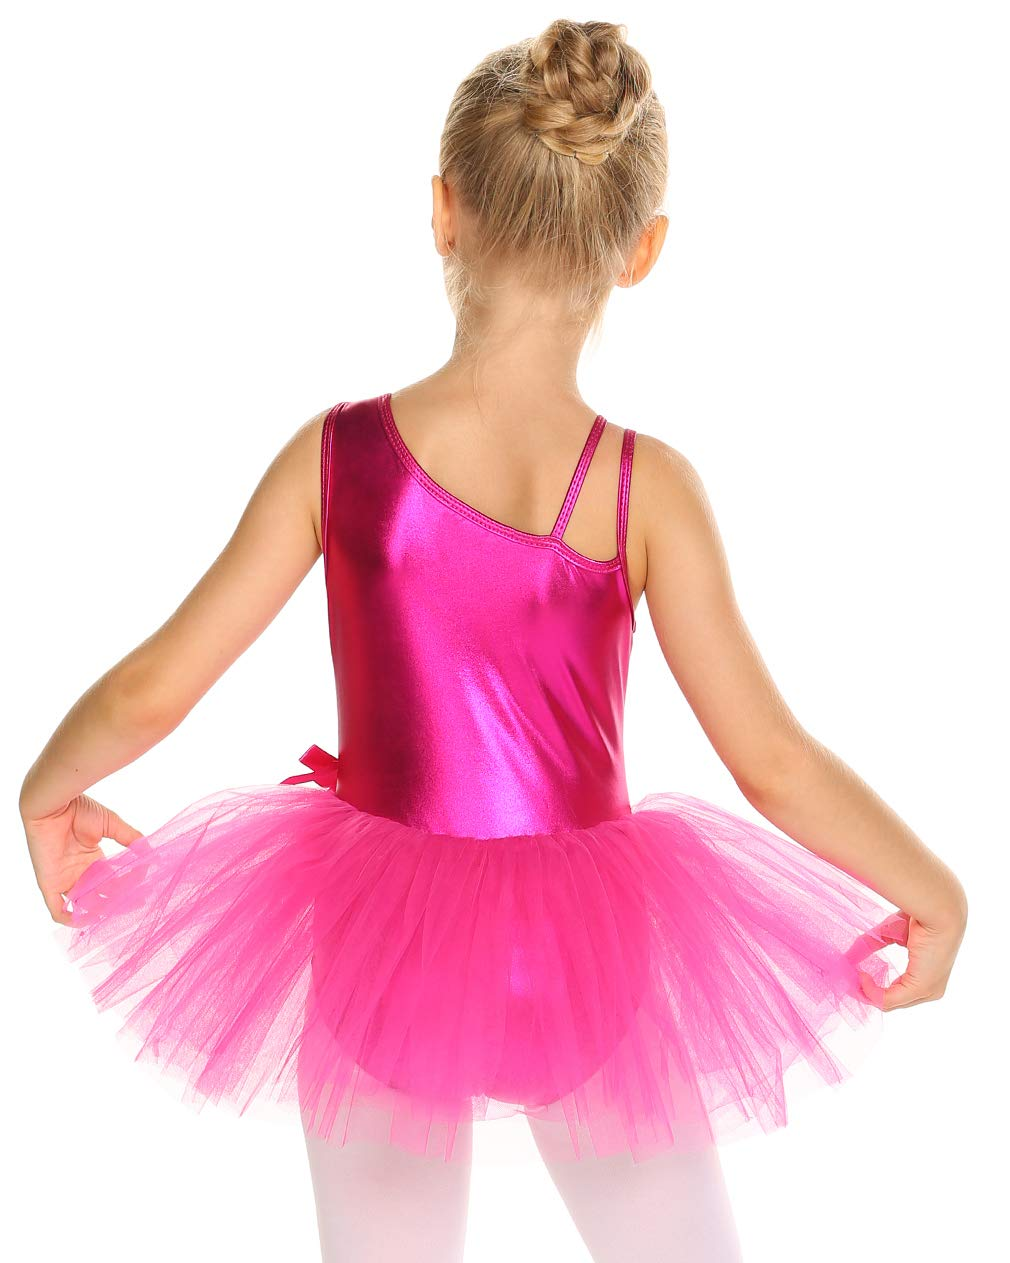 Arshiner Kids Girls Gymnastics Leotards One-Piece Dance Ballet Dress Wrap Skirted